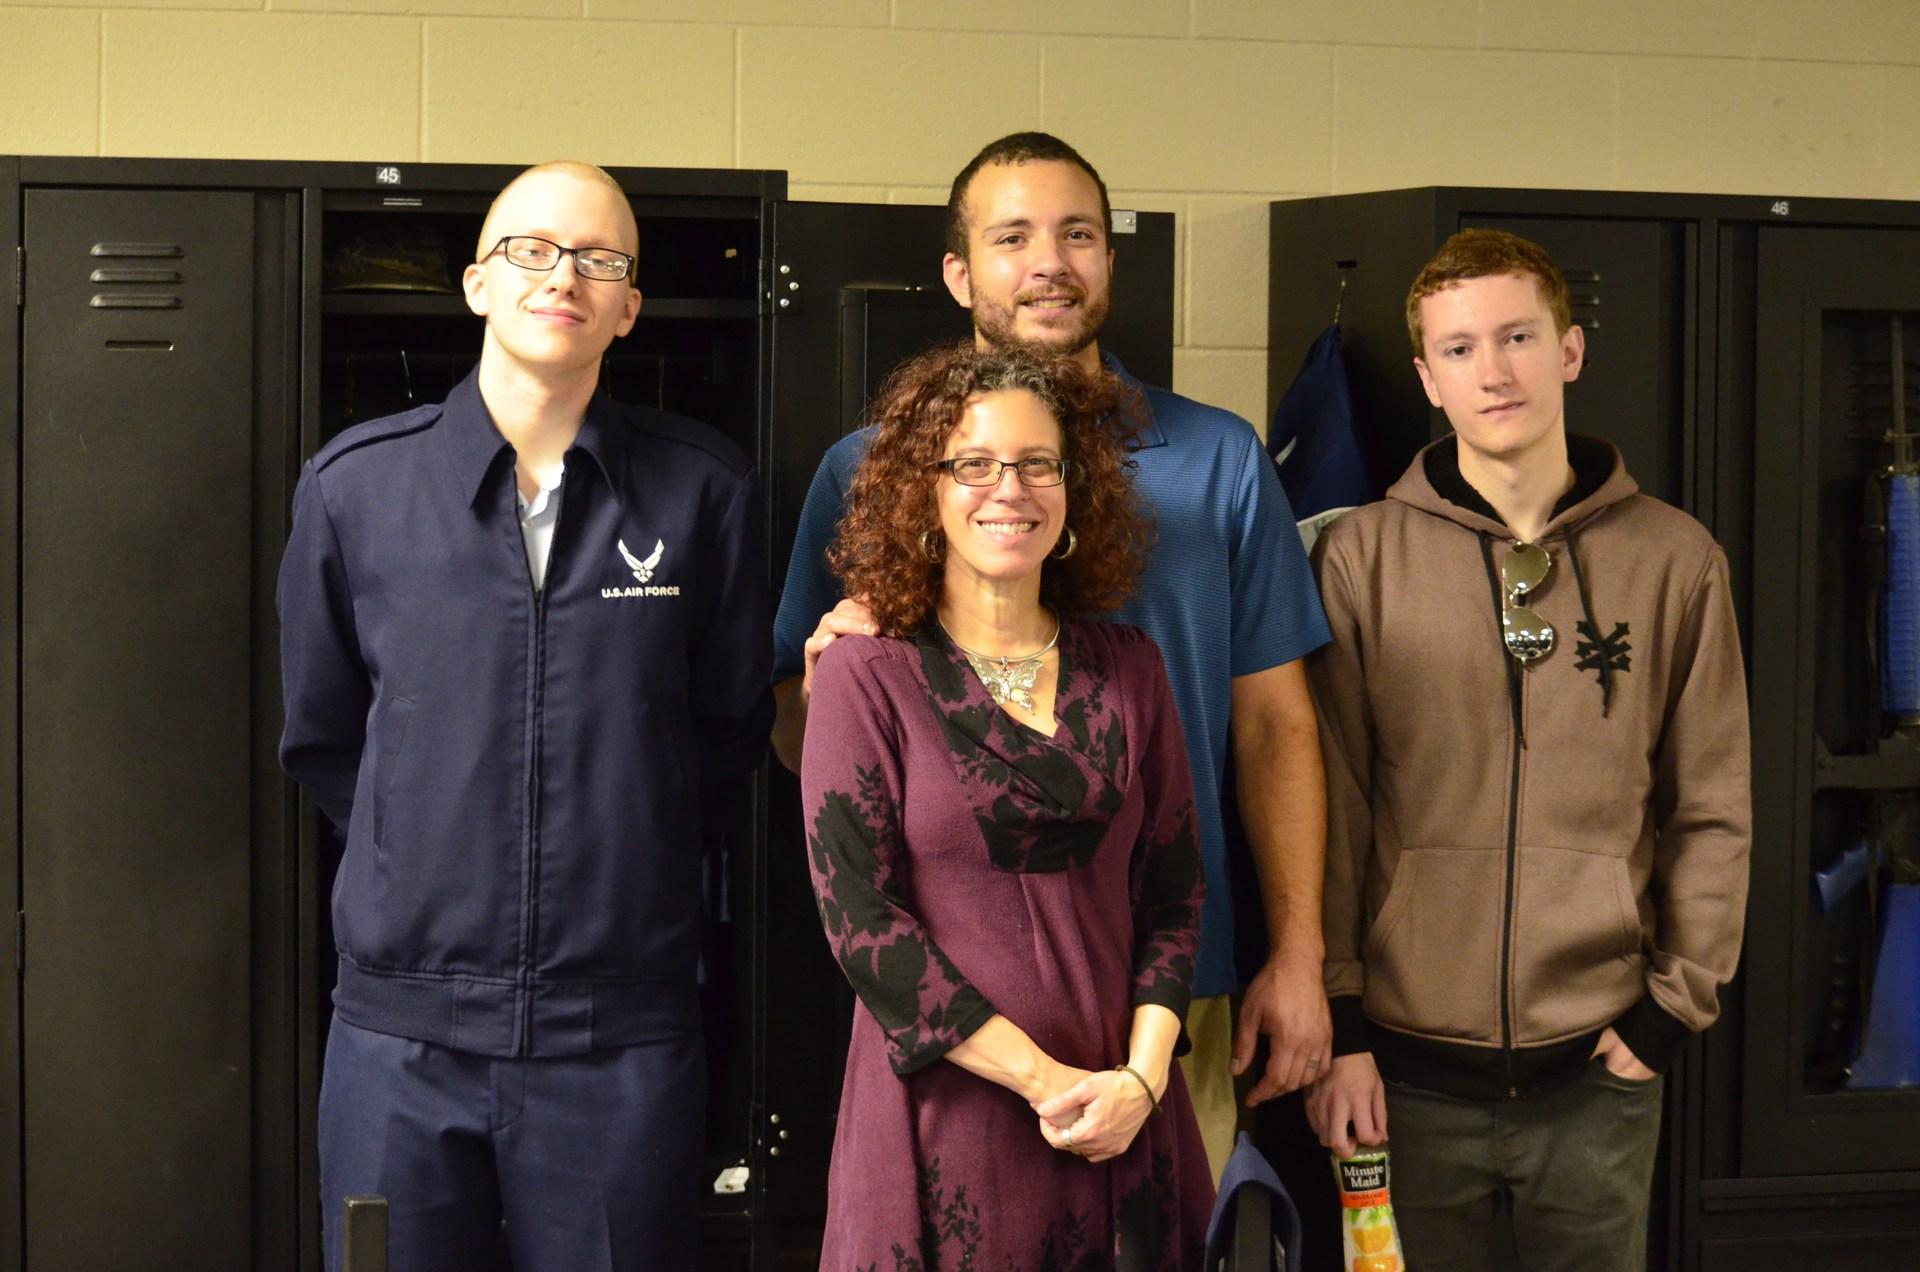 Ms. A, Ben, Dan and Jack